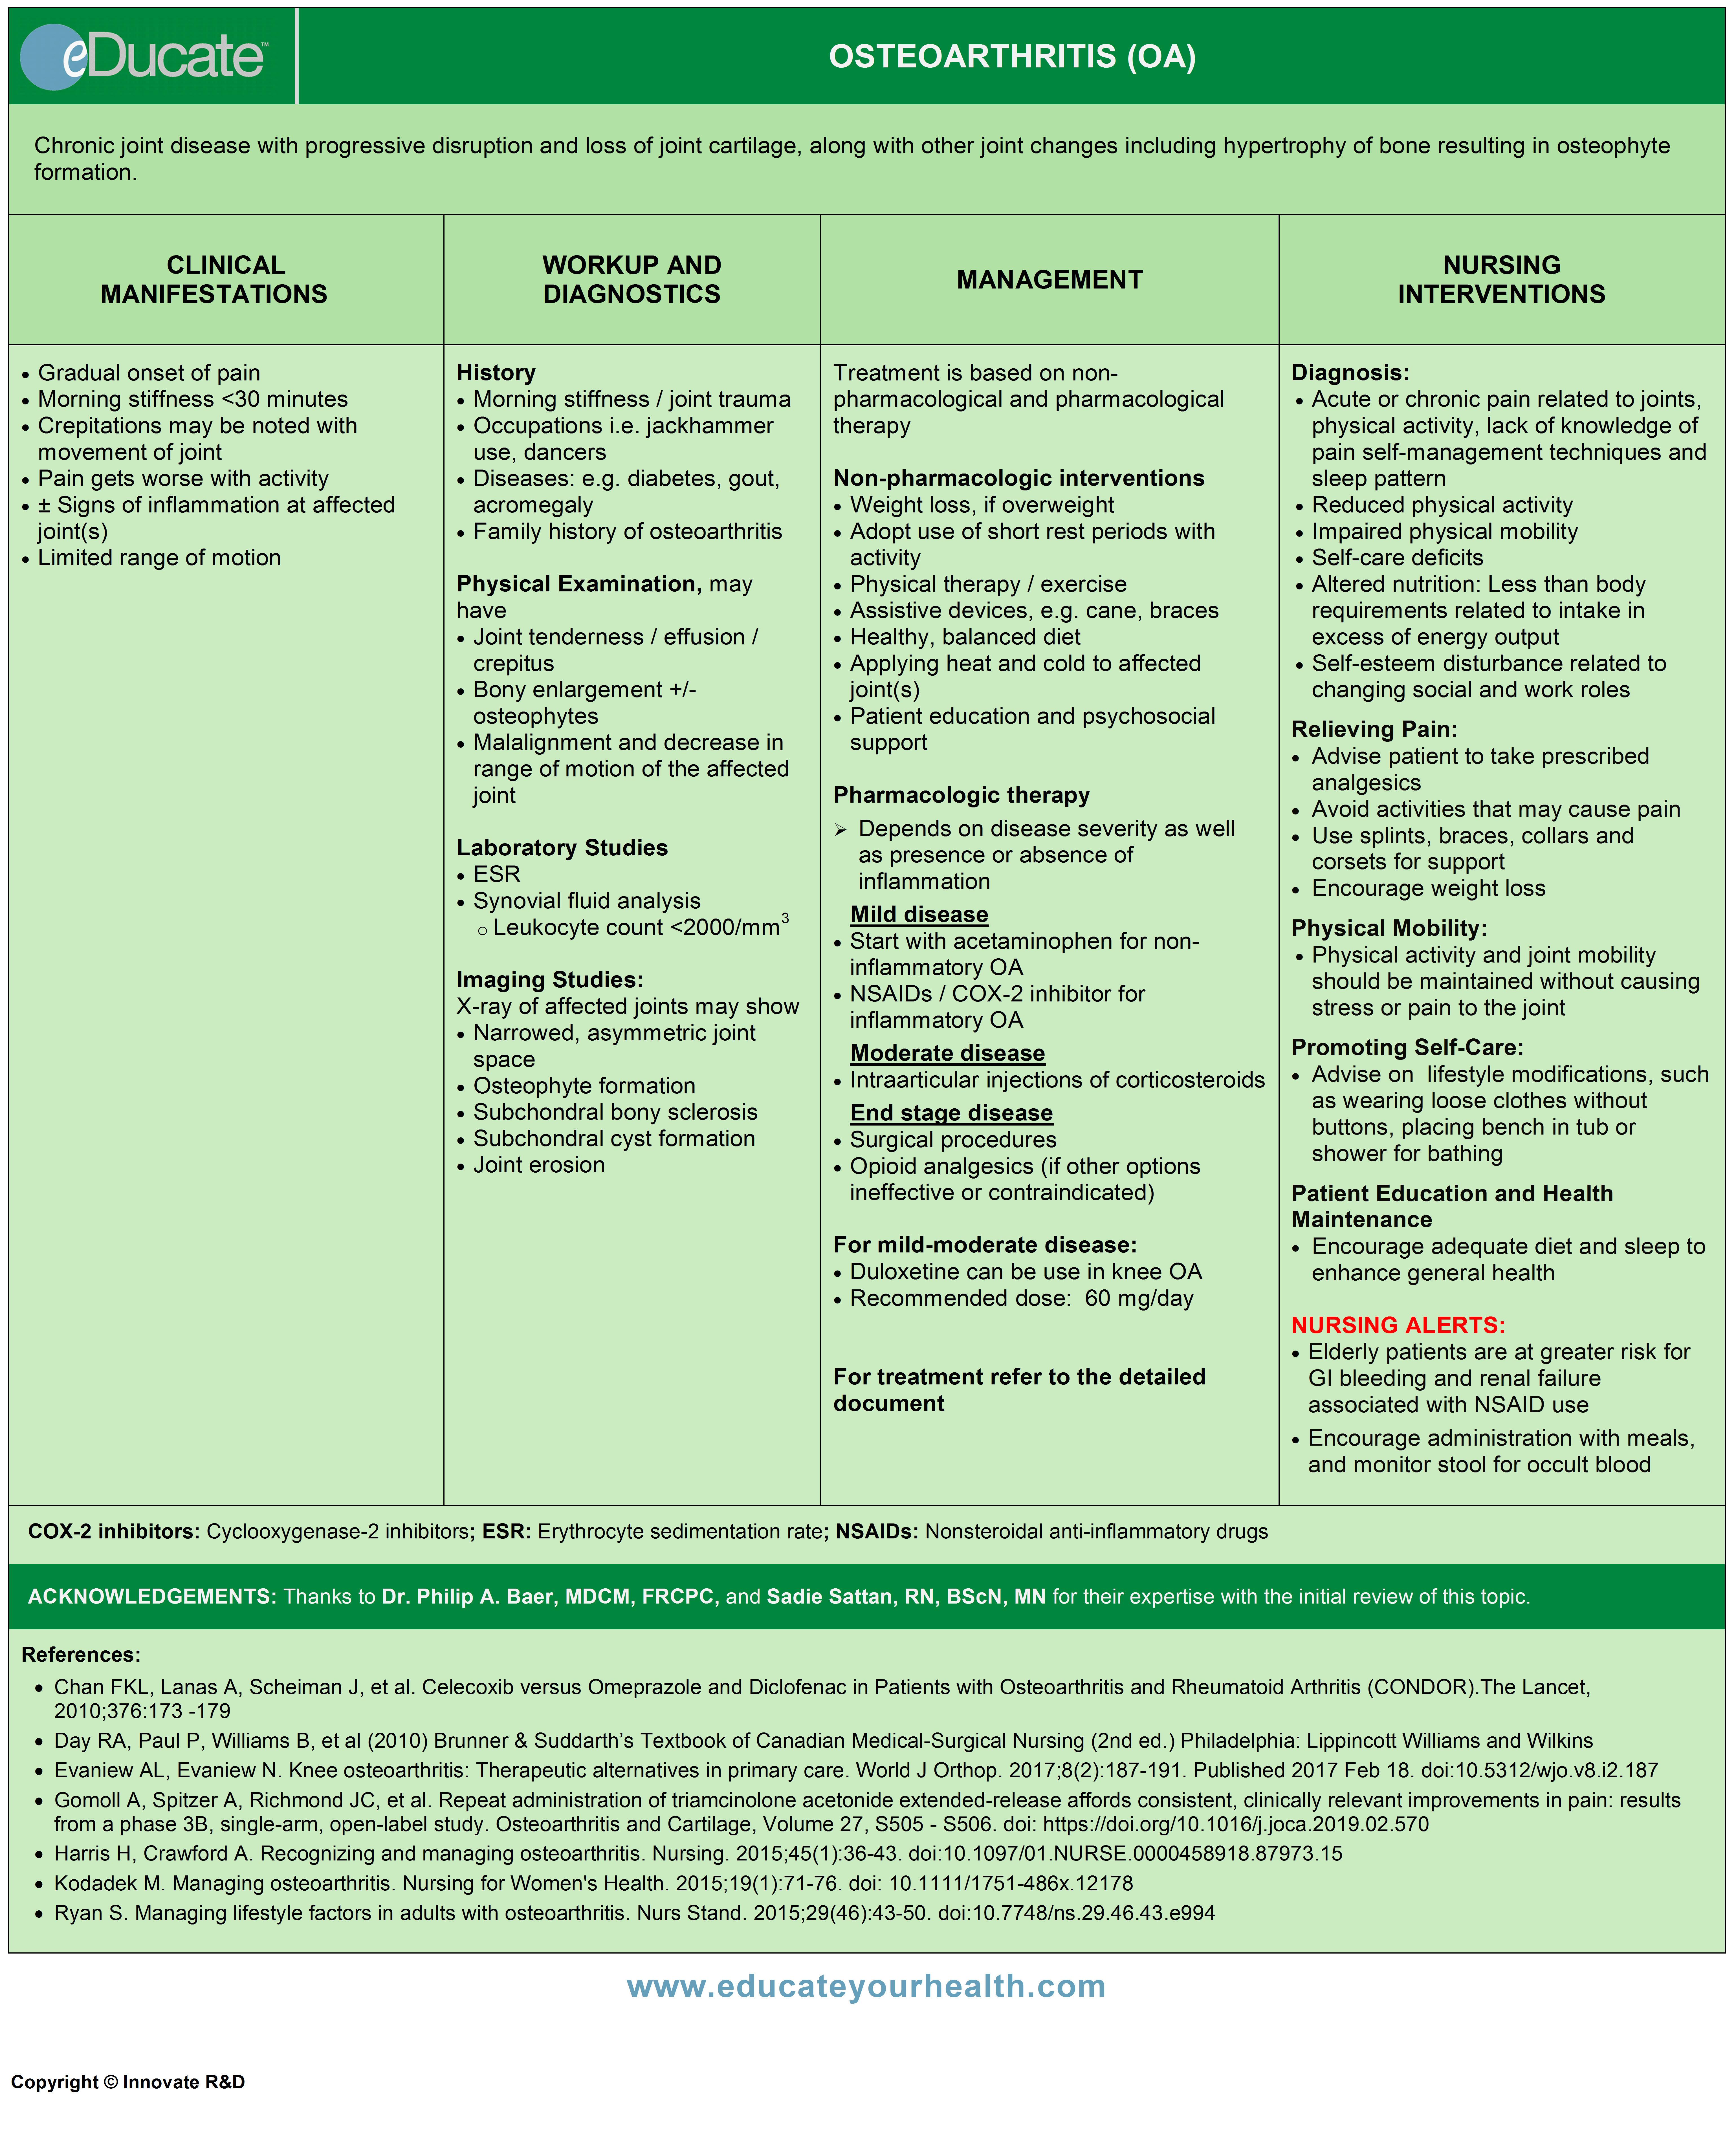 Osteoarthritis-QR